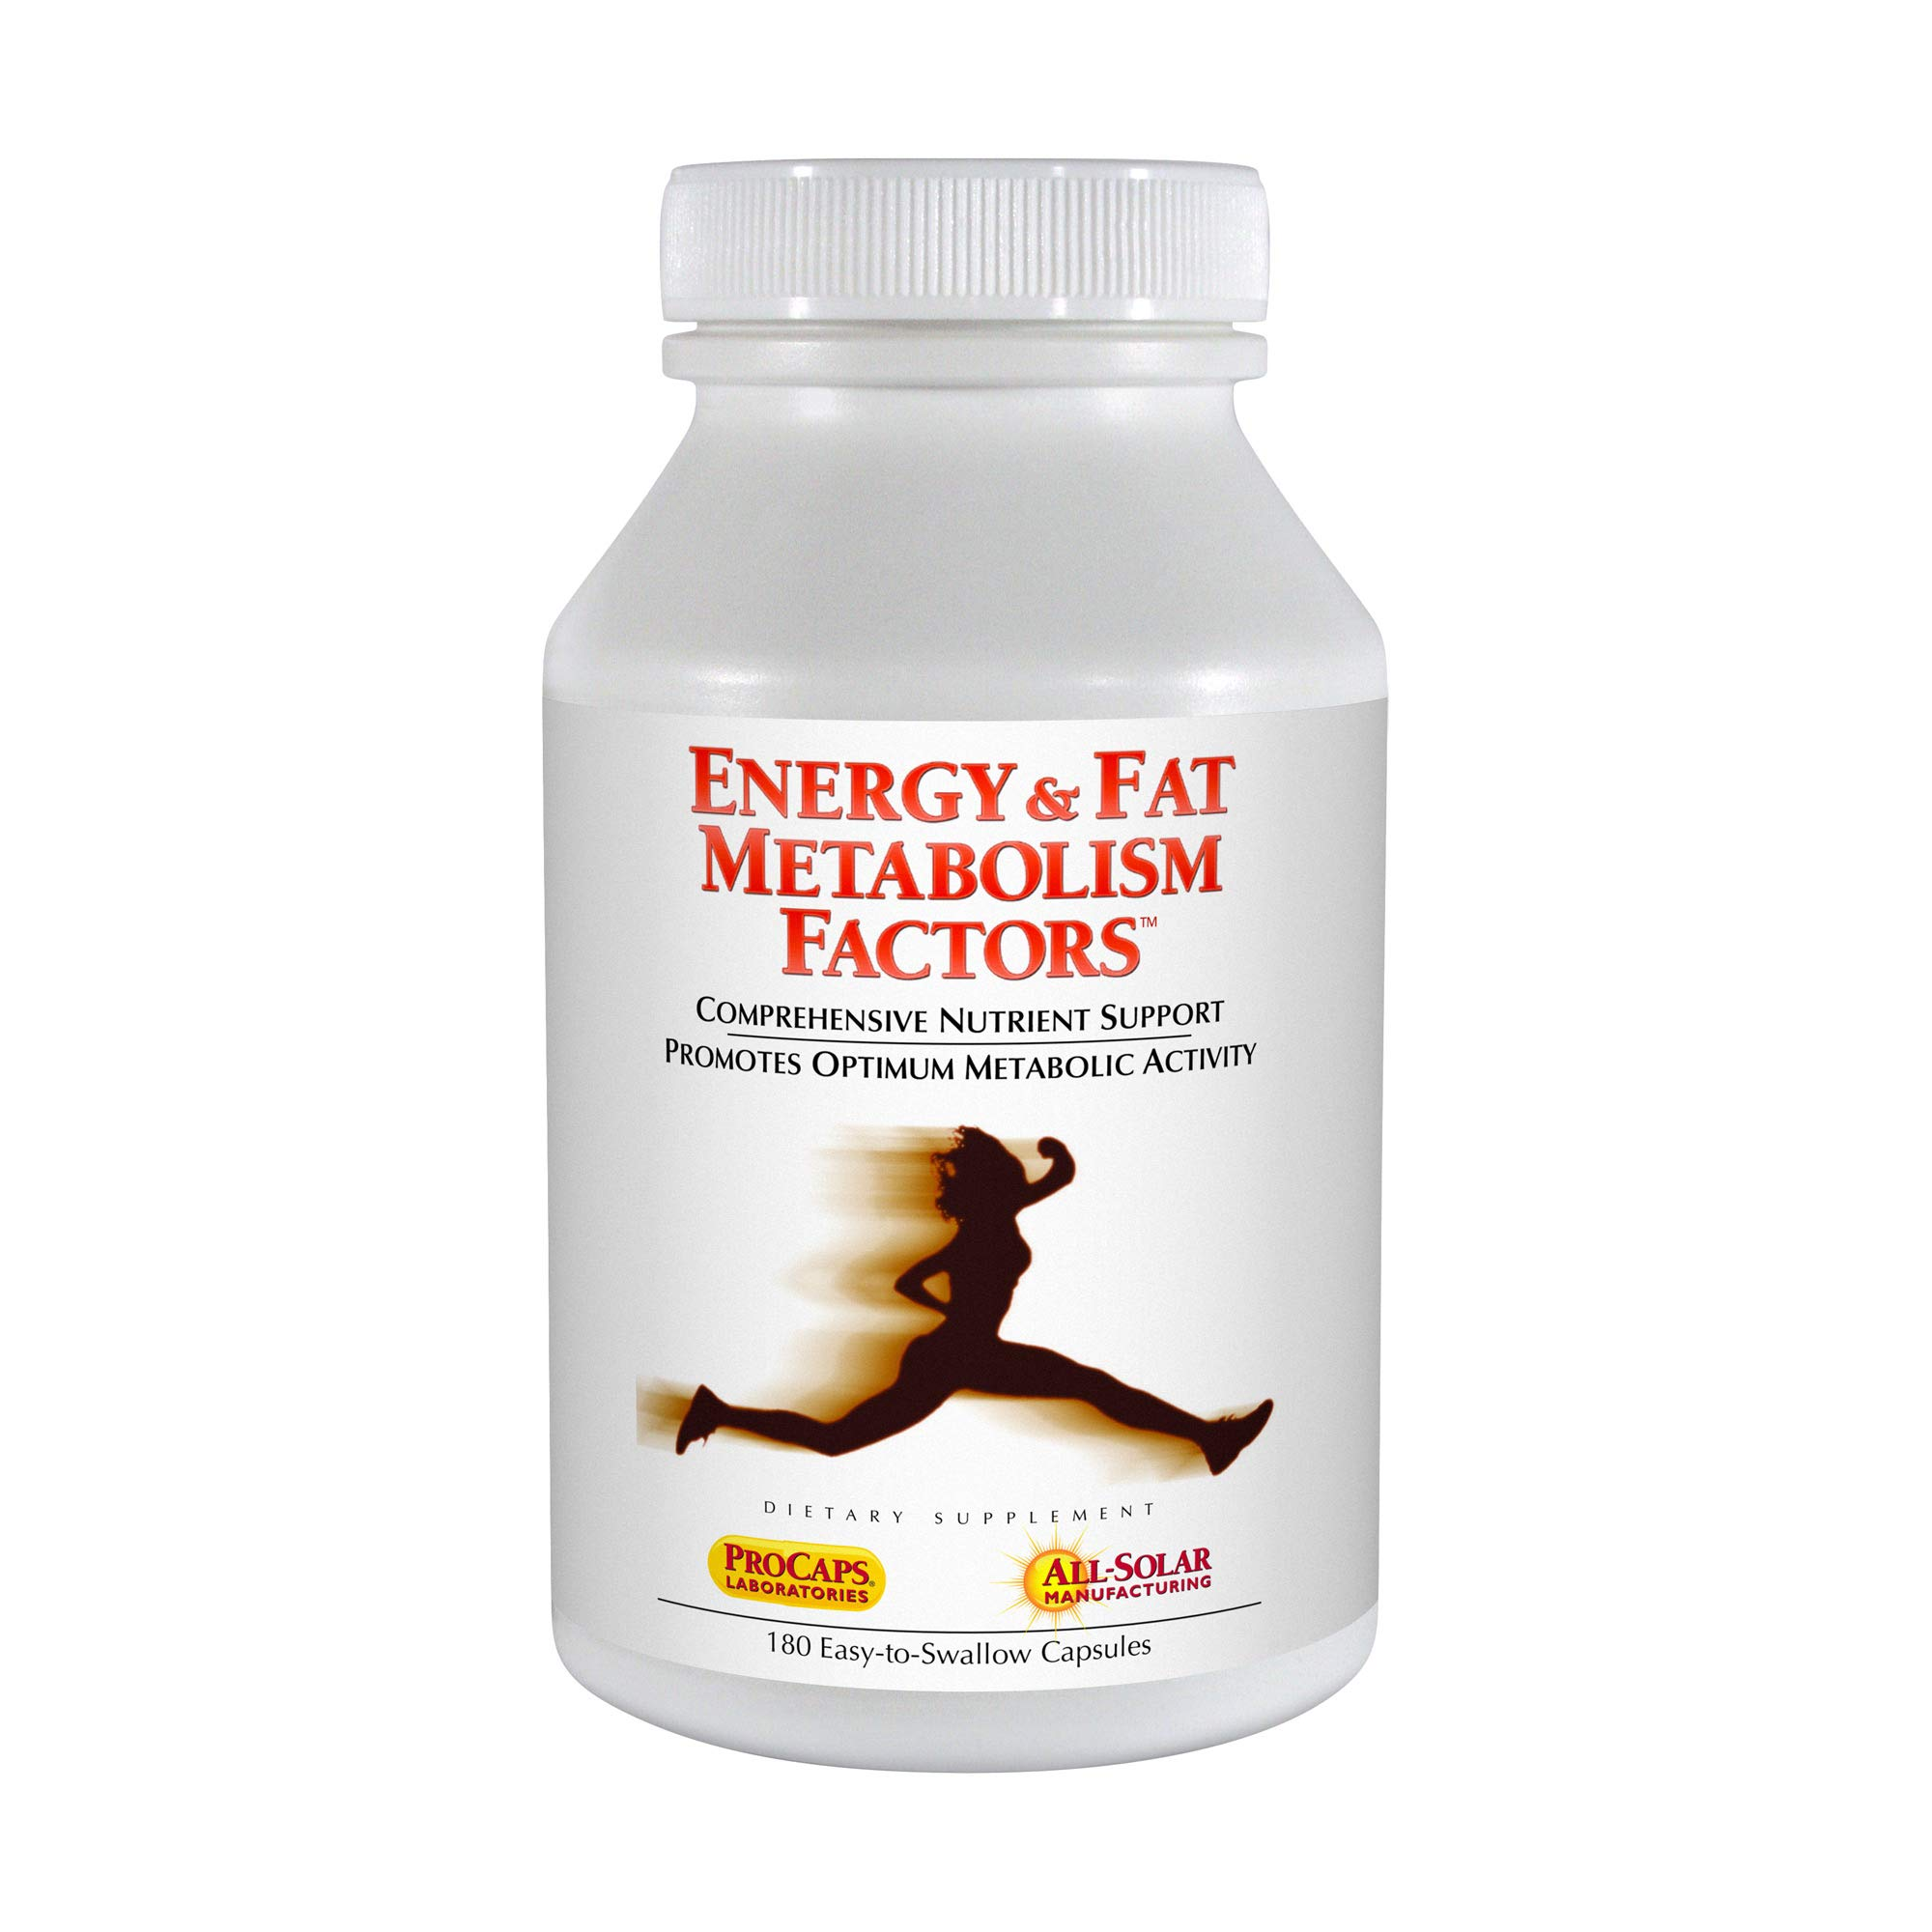 Andrew Lessman Energy & Fat Metabolism Factors, 180 Capsules